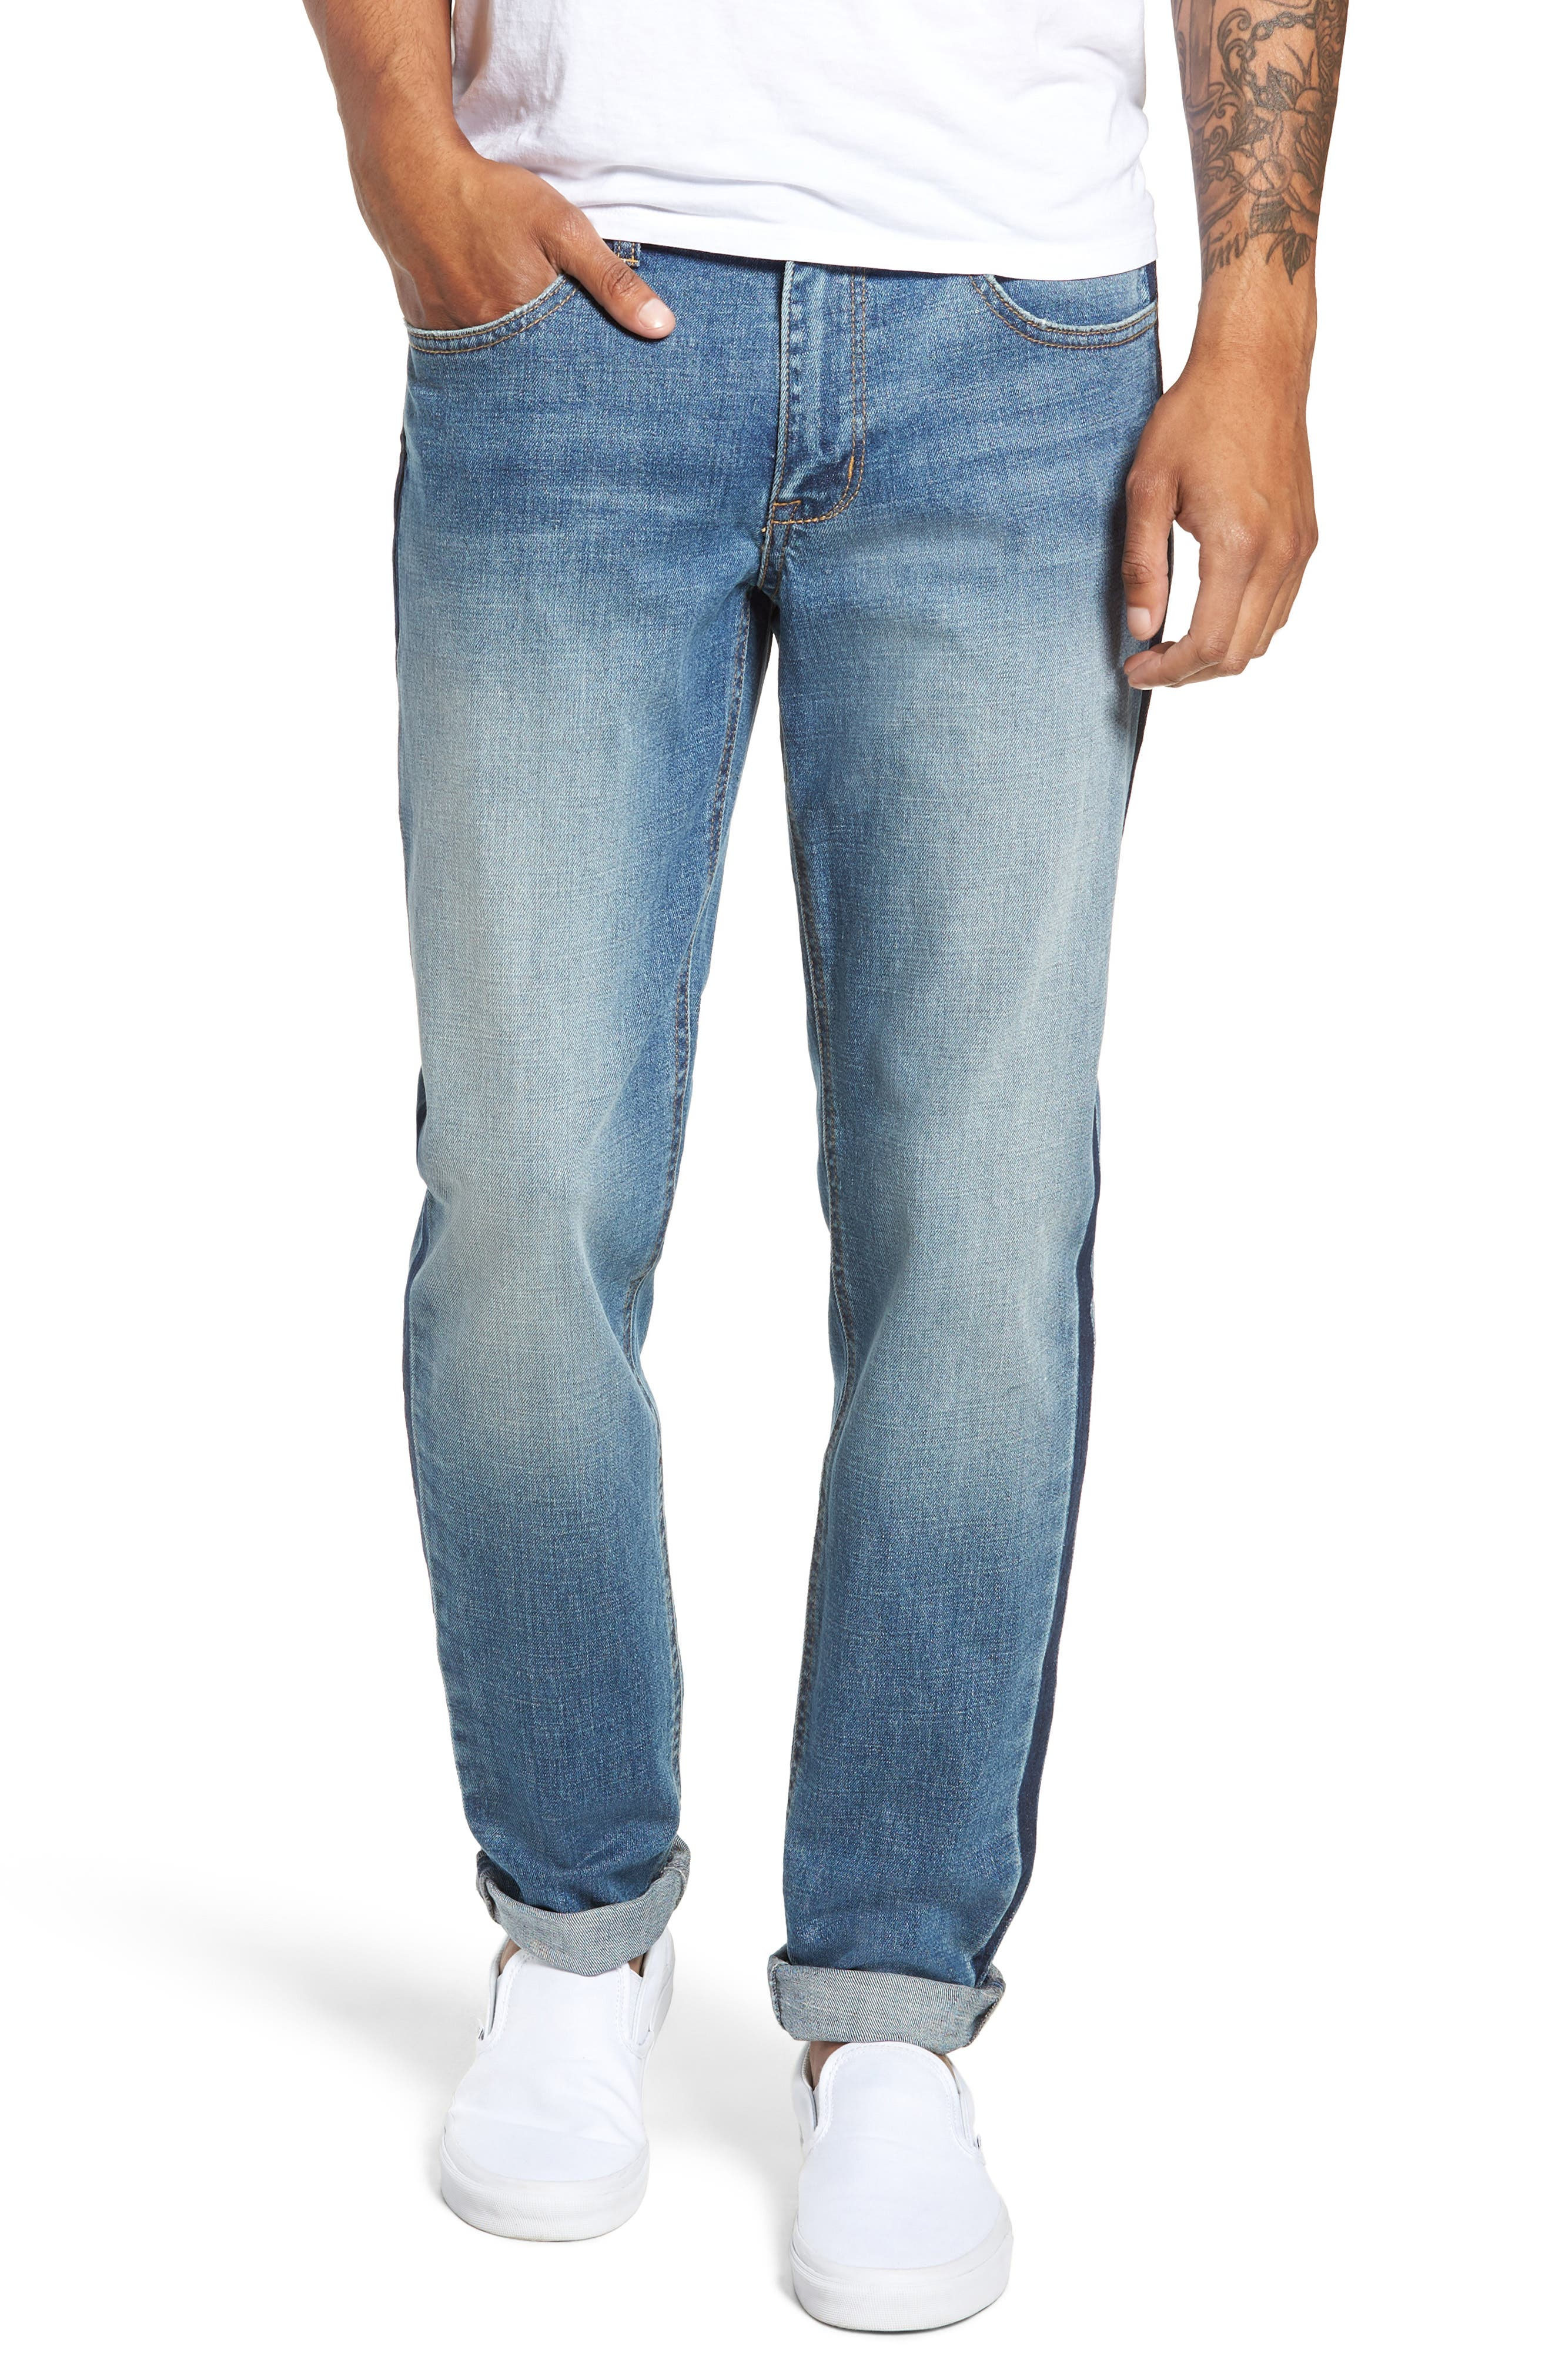 Slim Fit Side Stripe Jeans,                             Main thumbnail 1, color,                             BLUE STALEY WASH